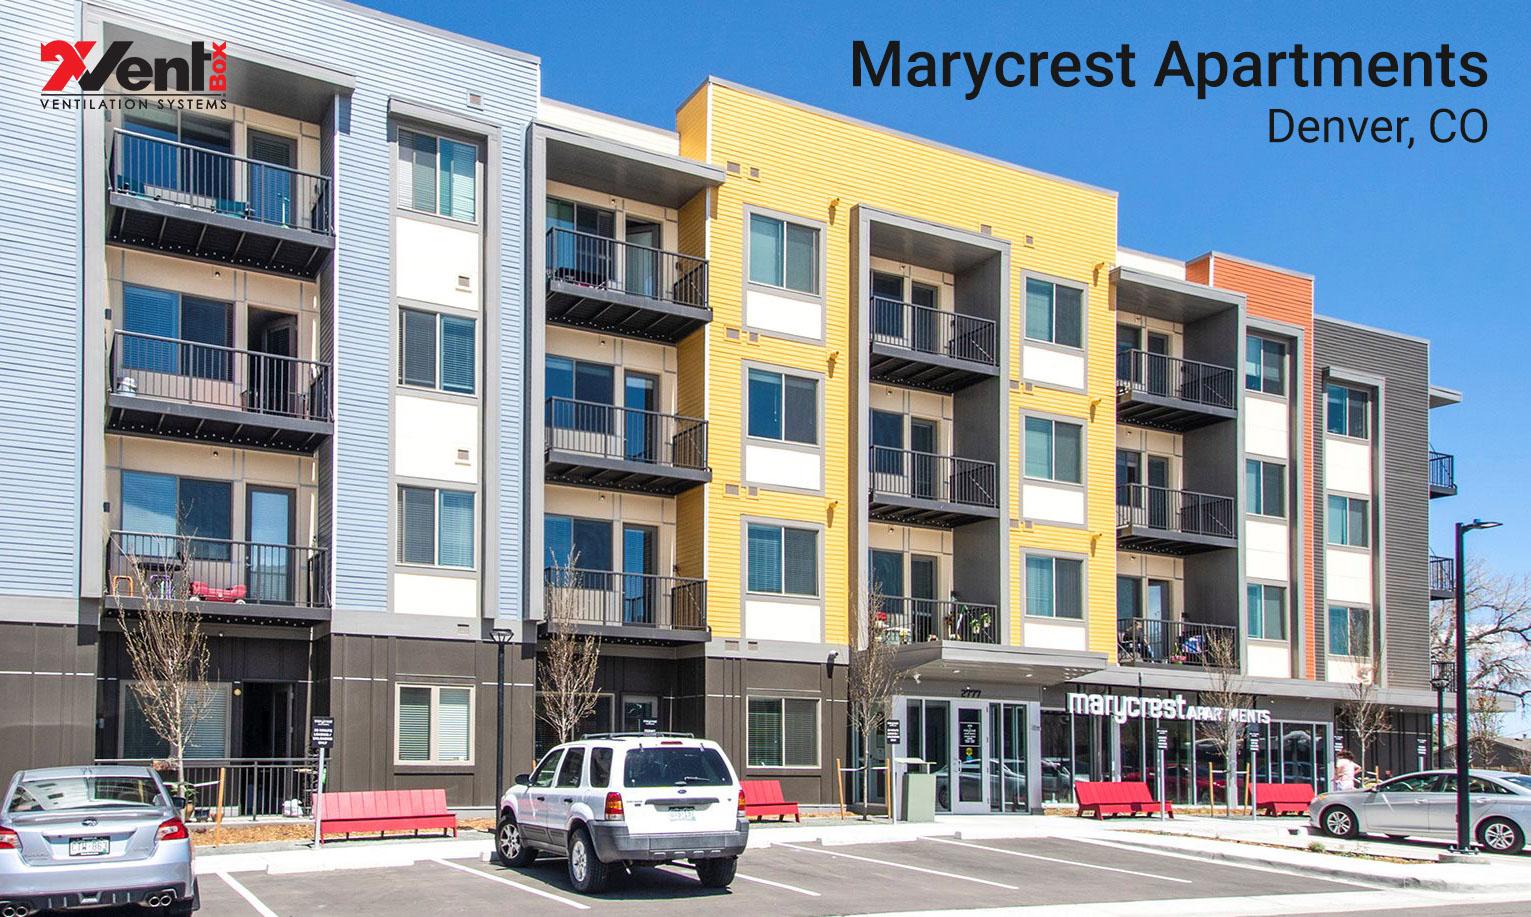 Marycrest Apartments